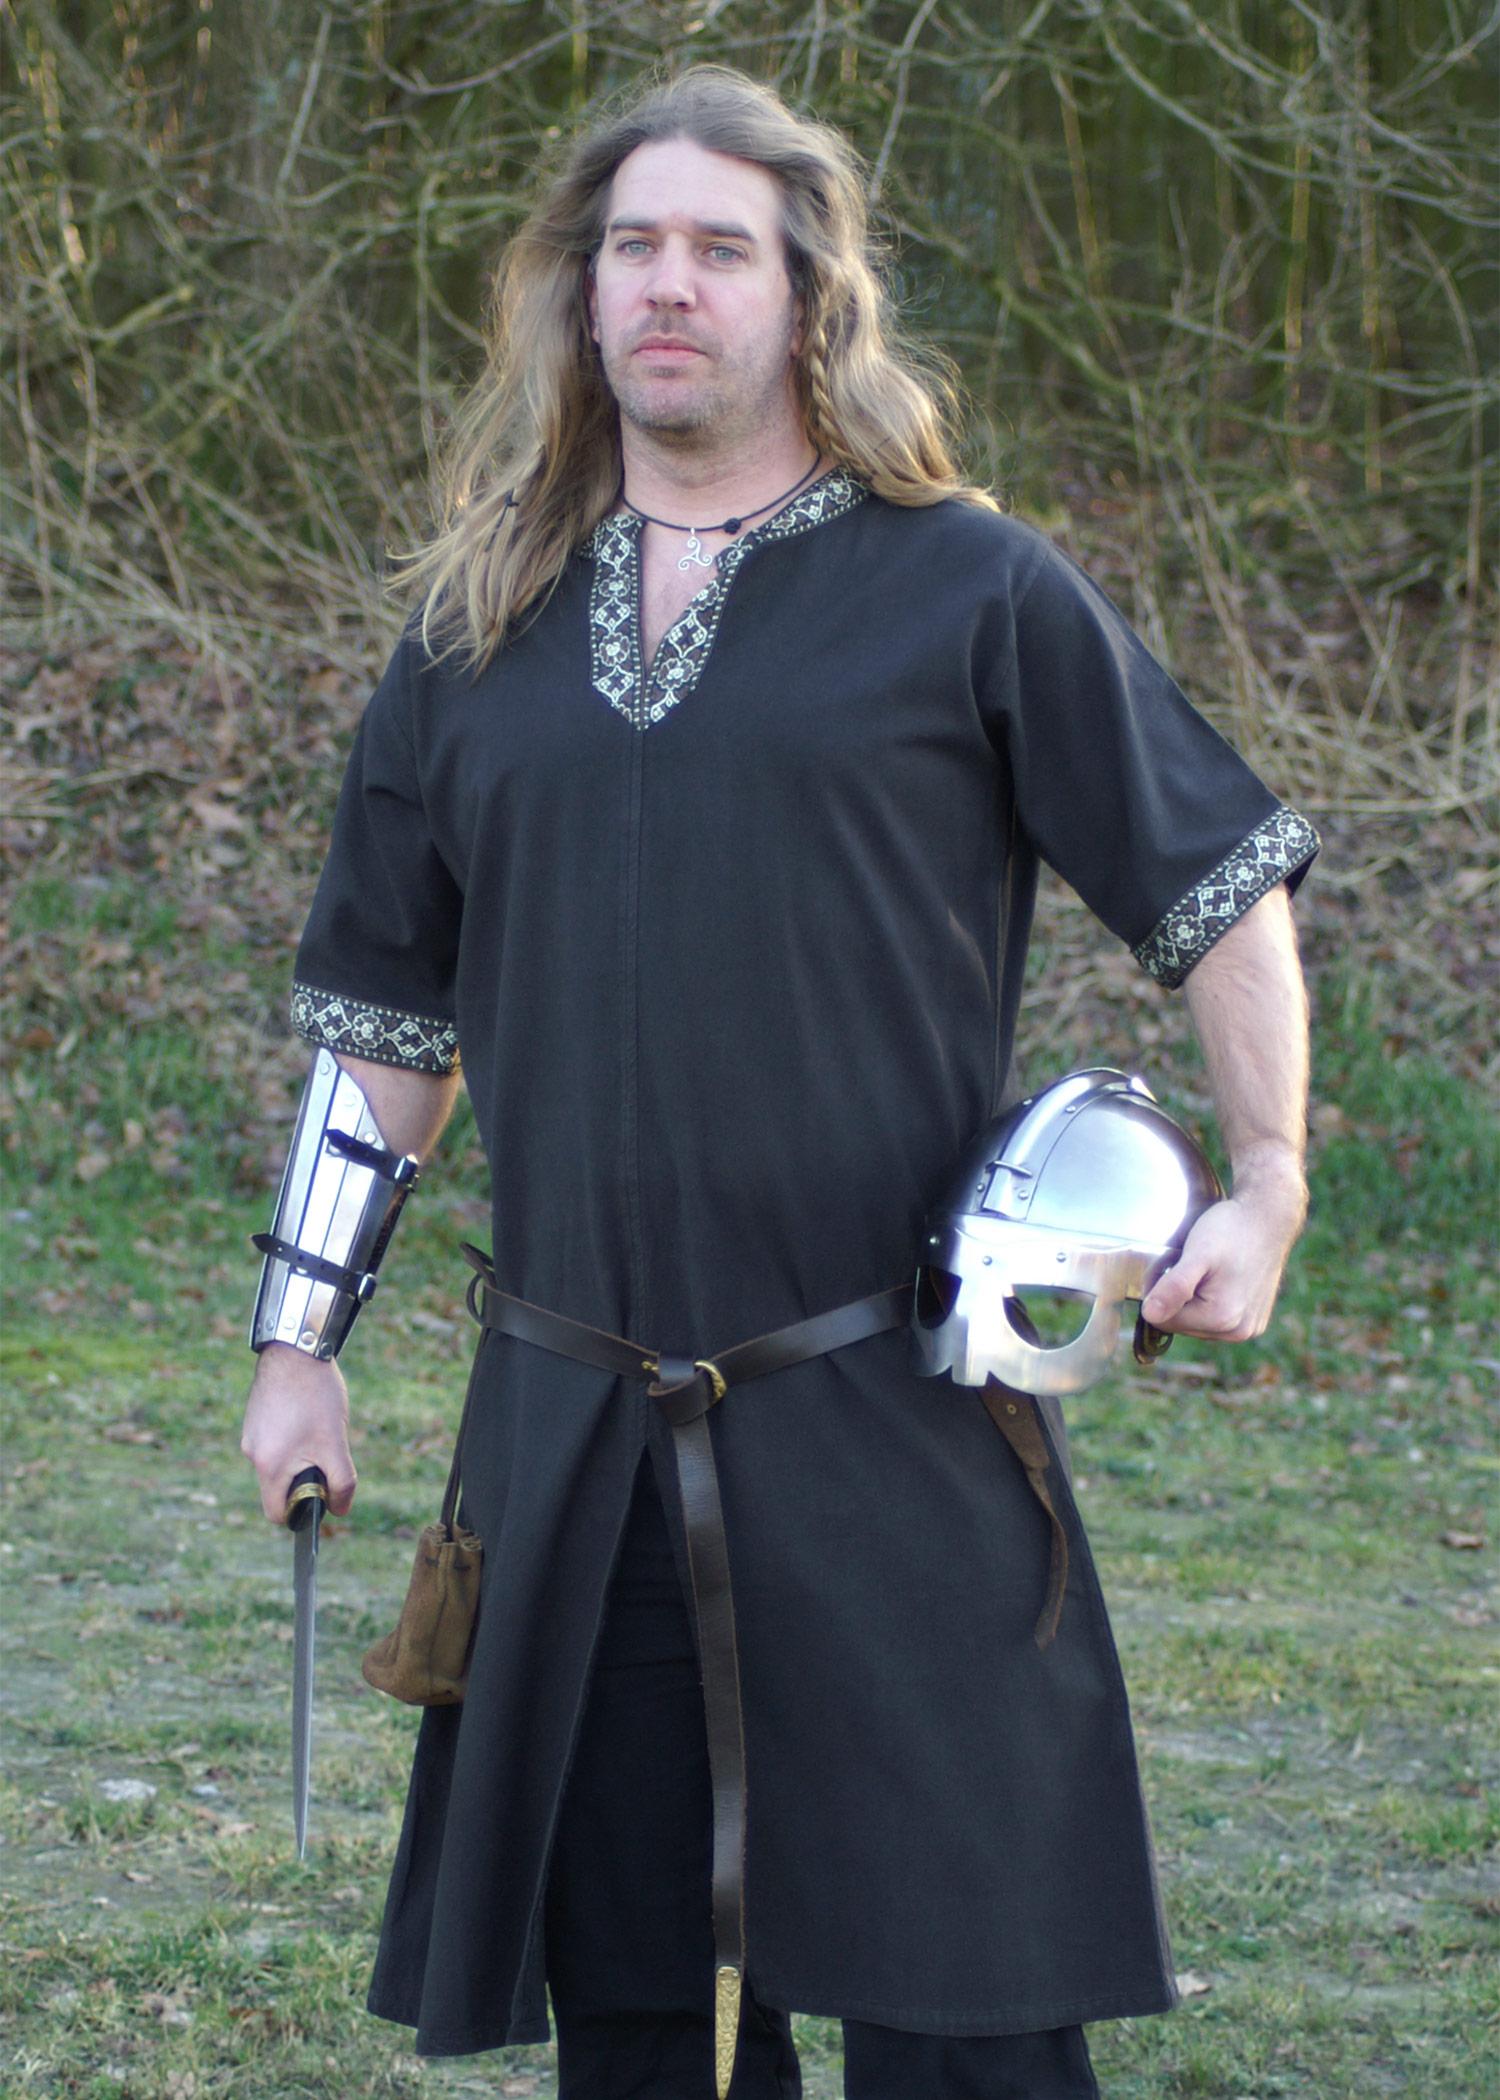 schwarz Mittelalter Reenactment LARP Bekleidung Römer Tunika kurzarm